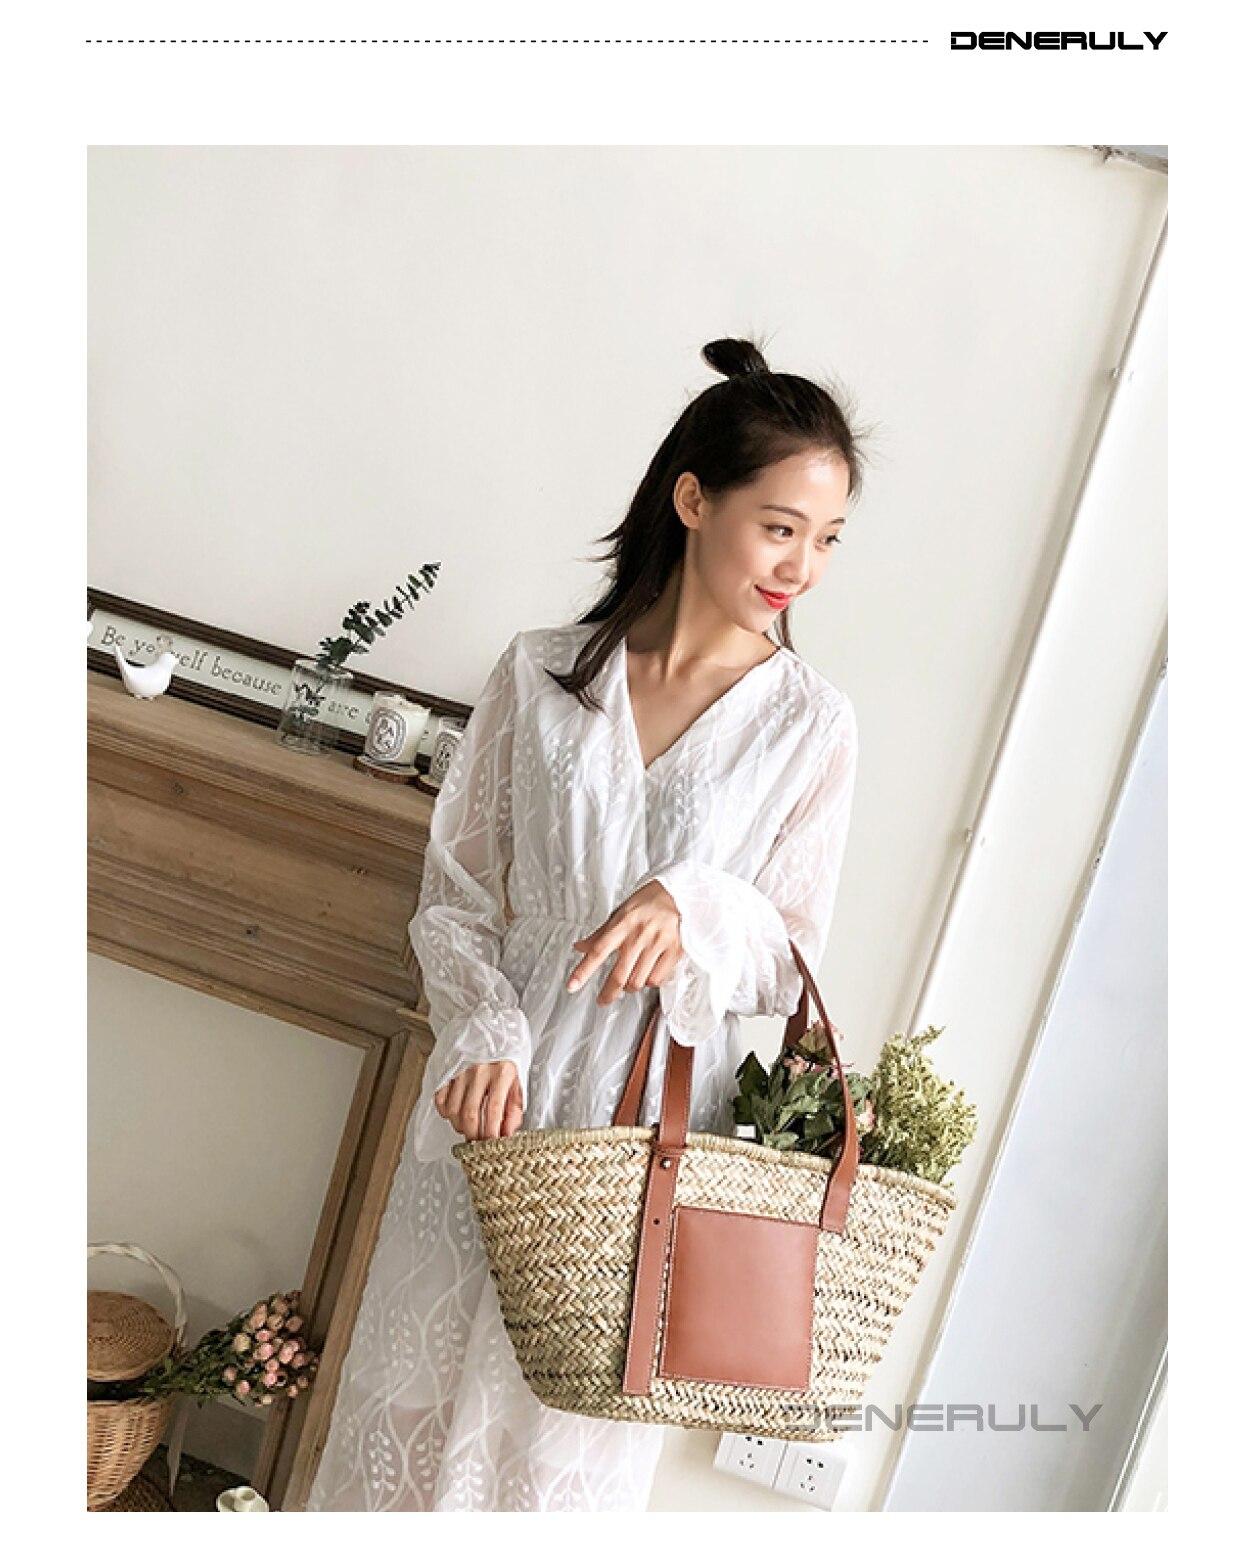 Beach Rattan Bag Women New Elegant Straw Bag Bolsos Mujer De Marca Famosa 2019 Bolso Paja Bolso Playa Designe Luxury Handbags 5